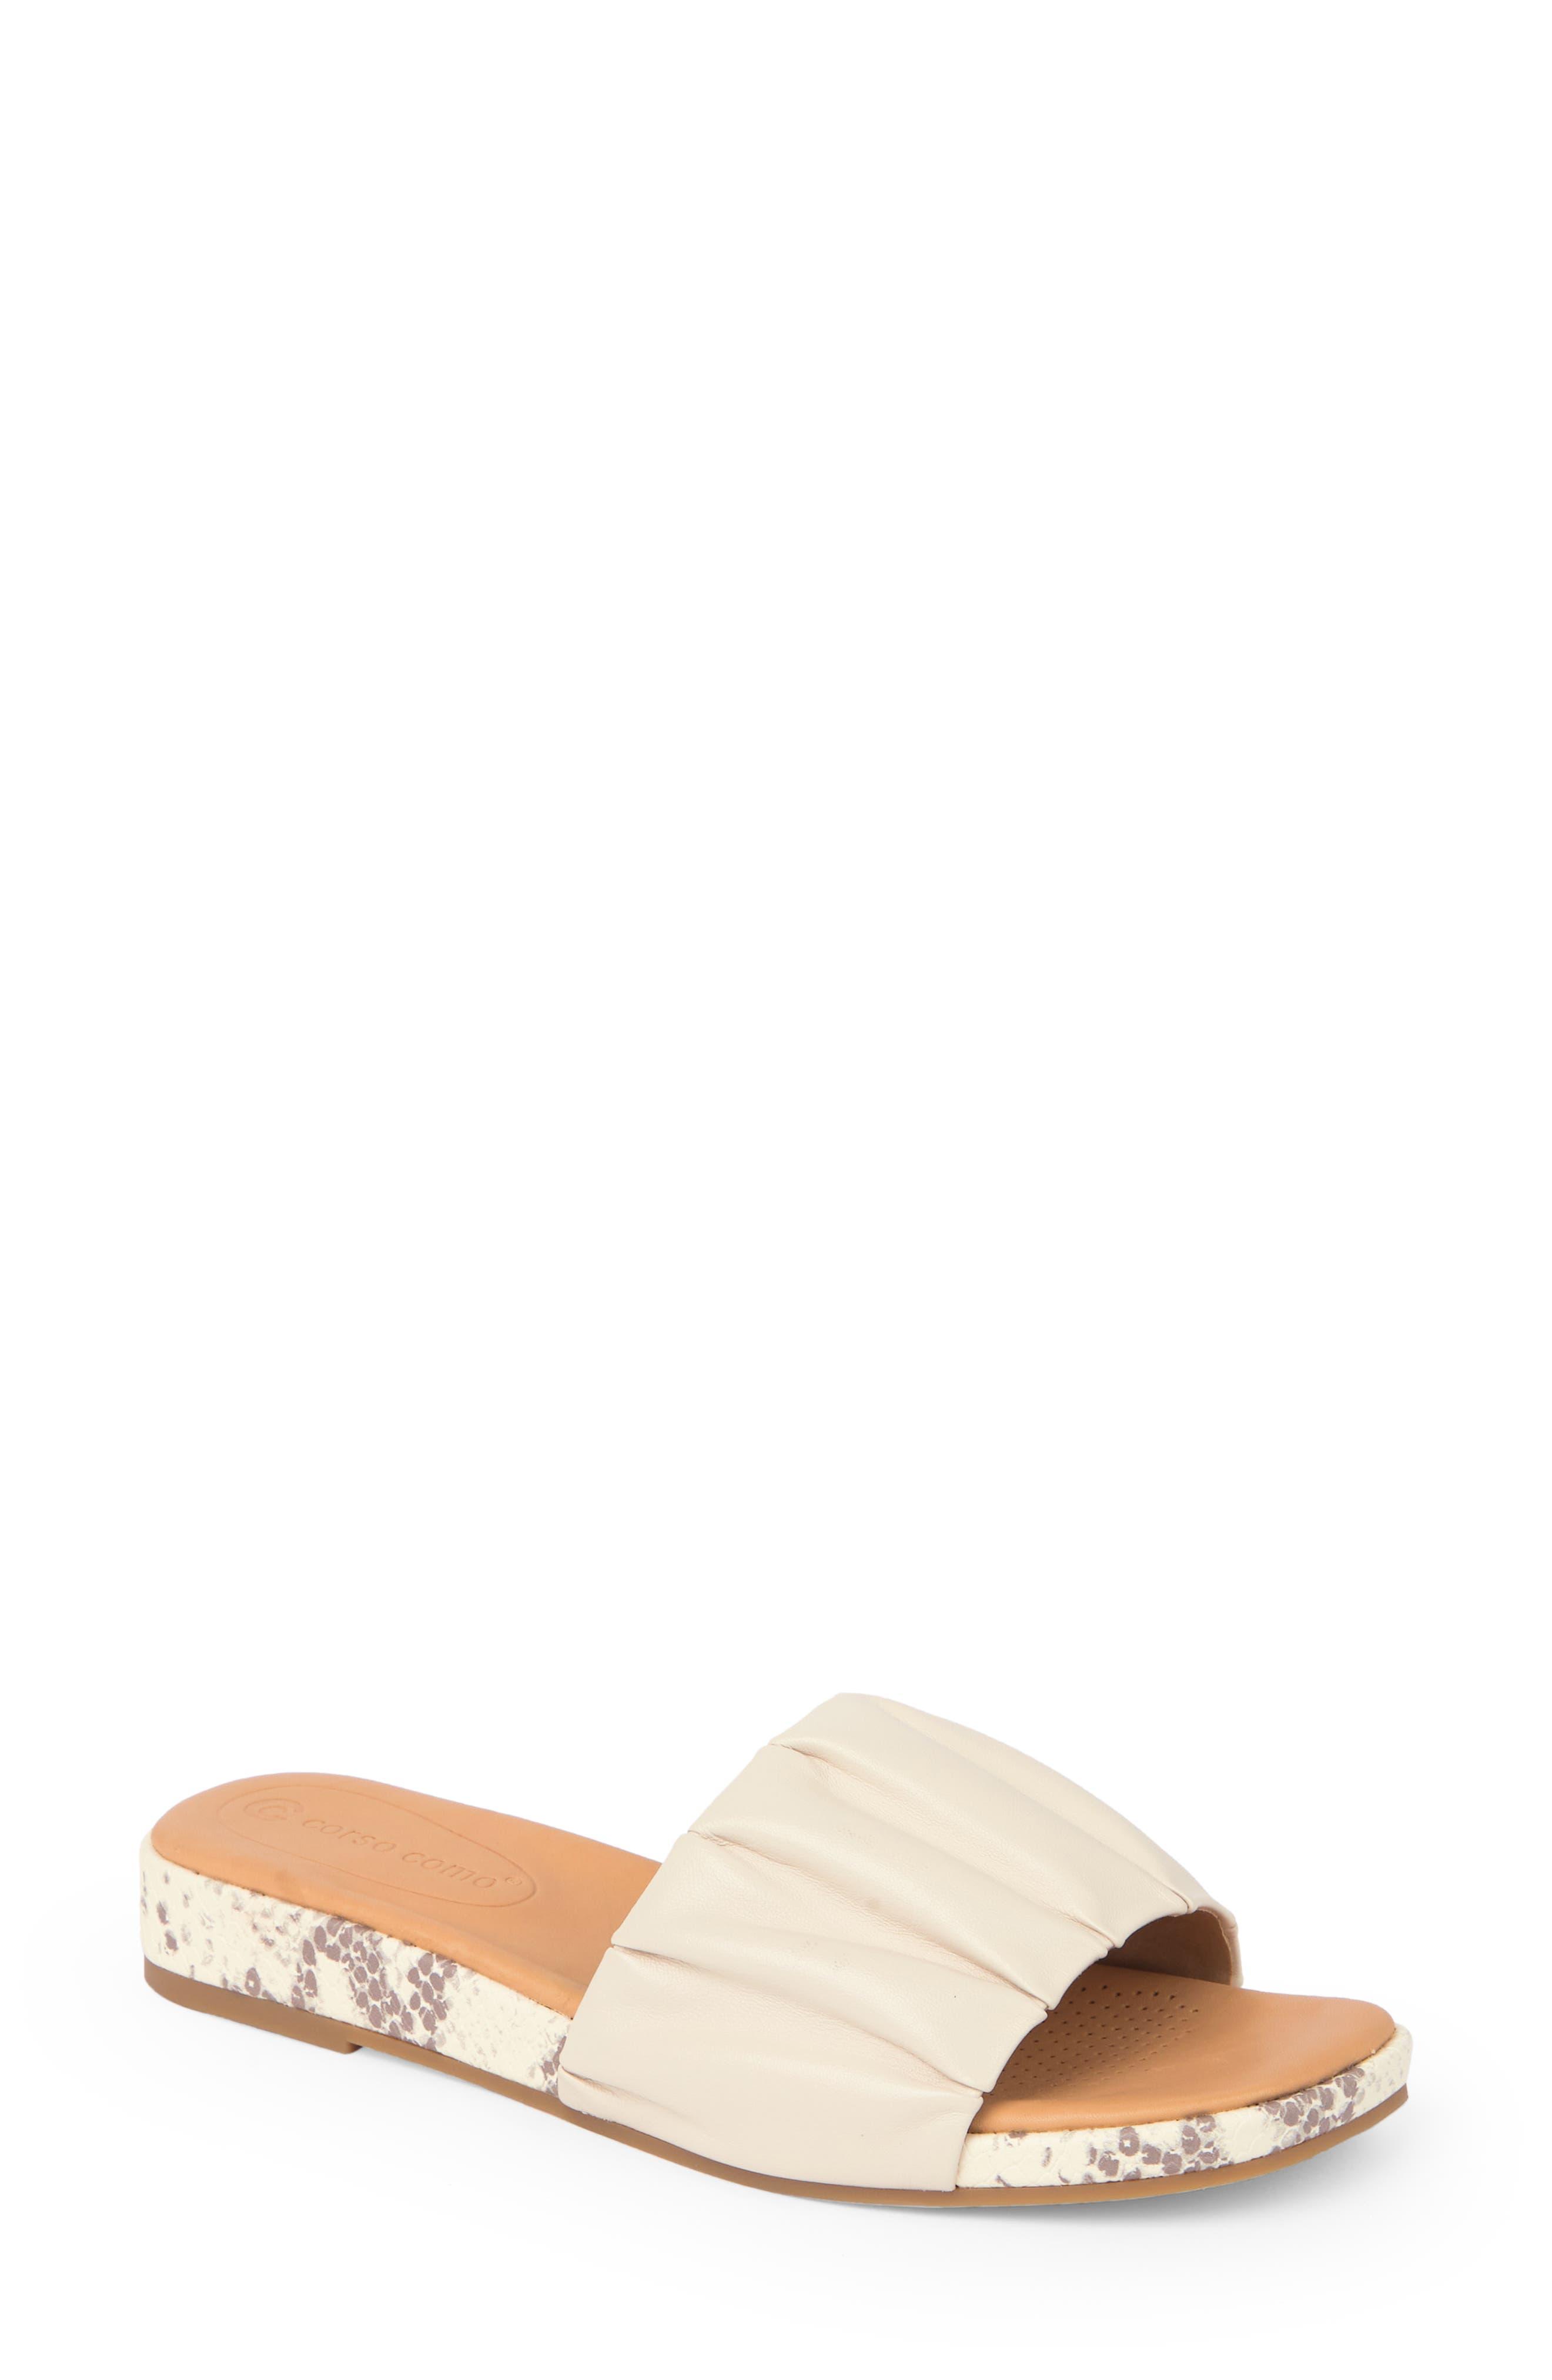 Harisya Wedge Slide Sandal